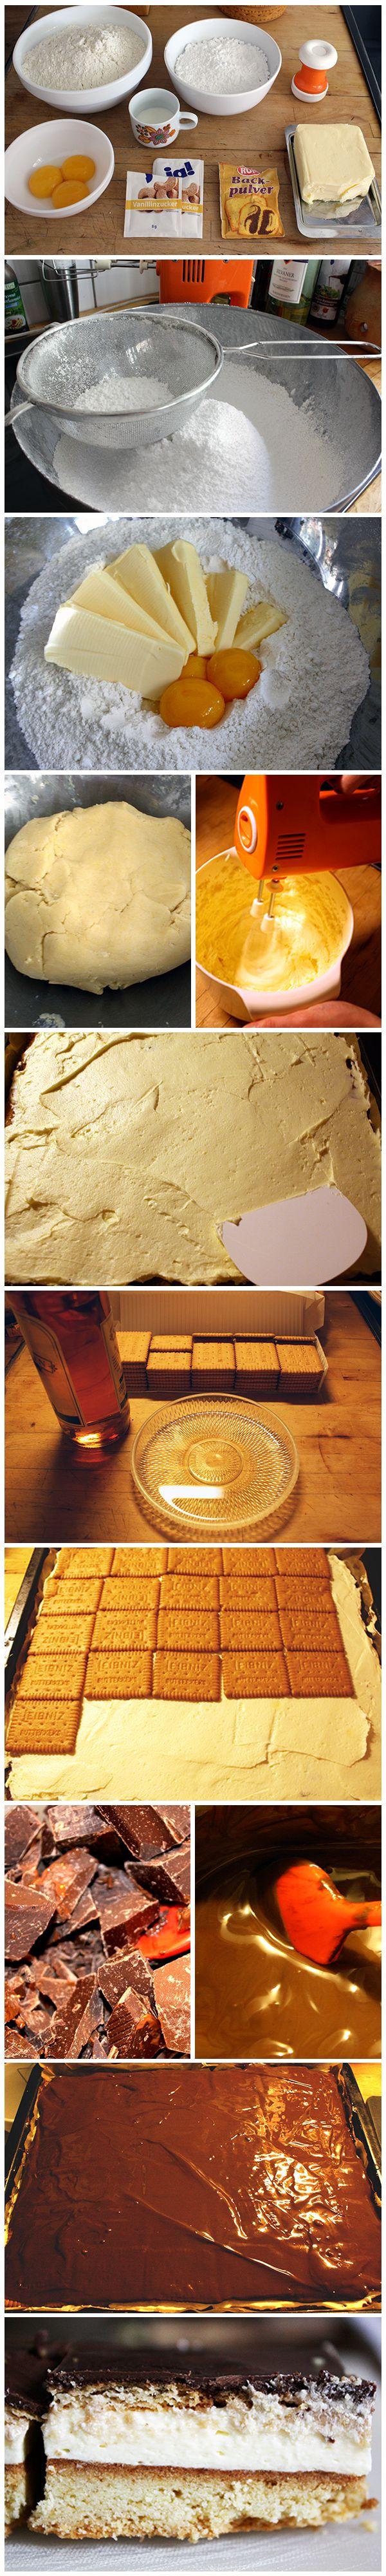 Inspirational LPG Kuchen Rezepte aus der DDR Rezept auf zsa zsa